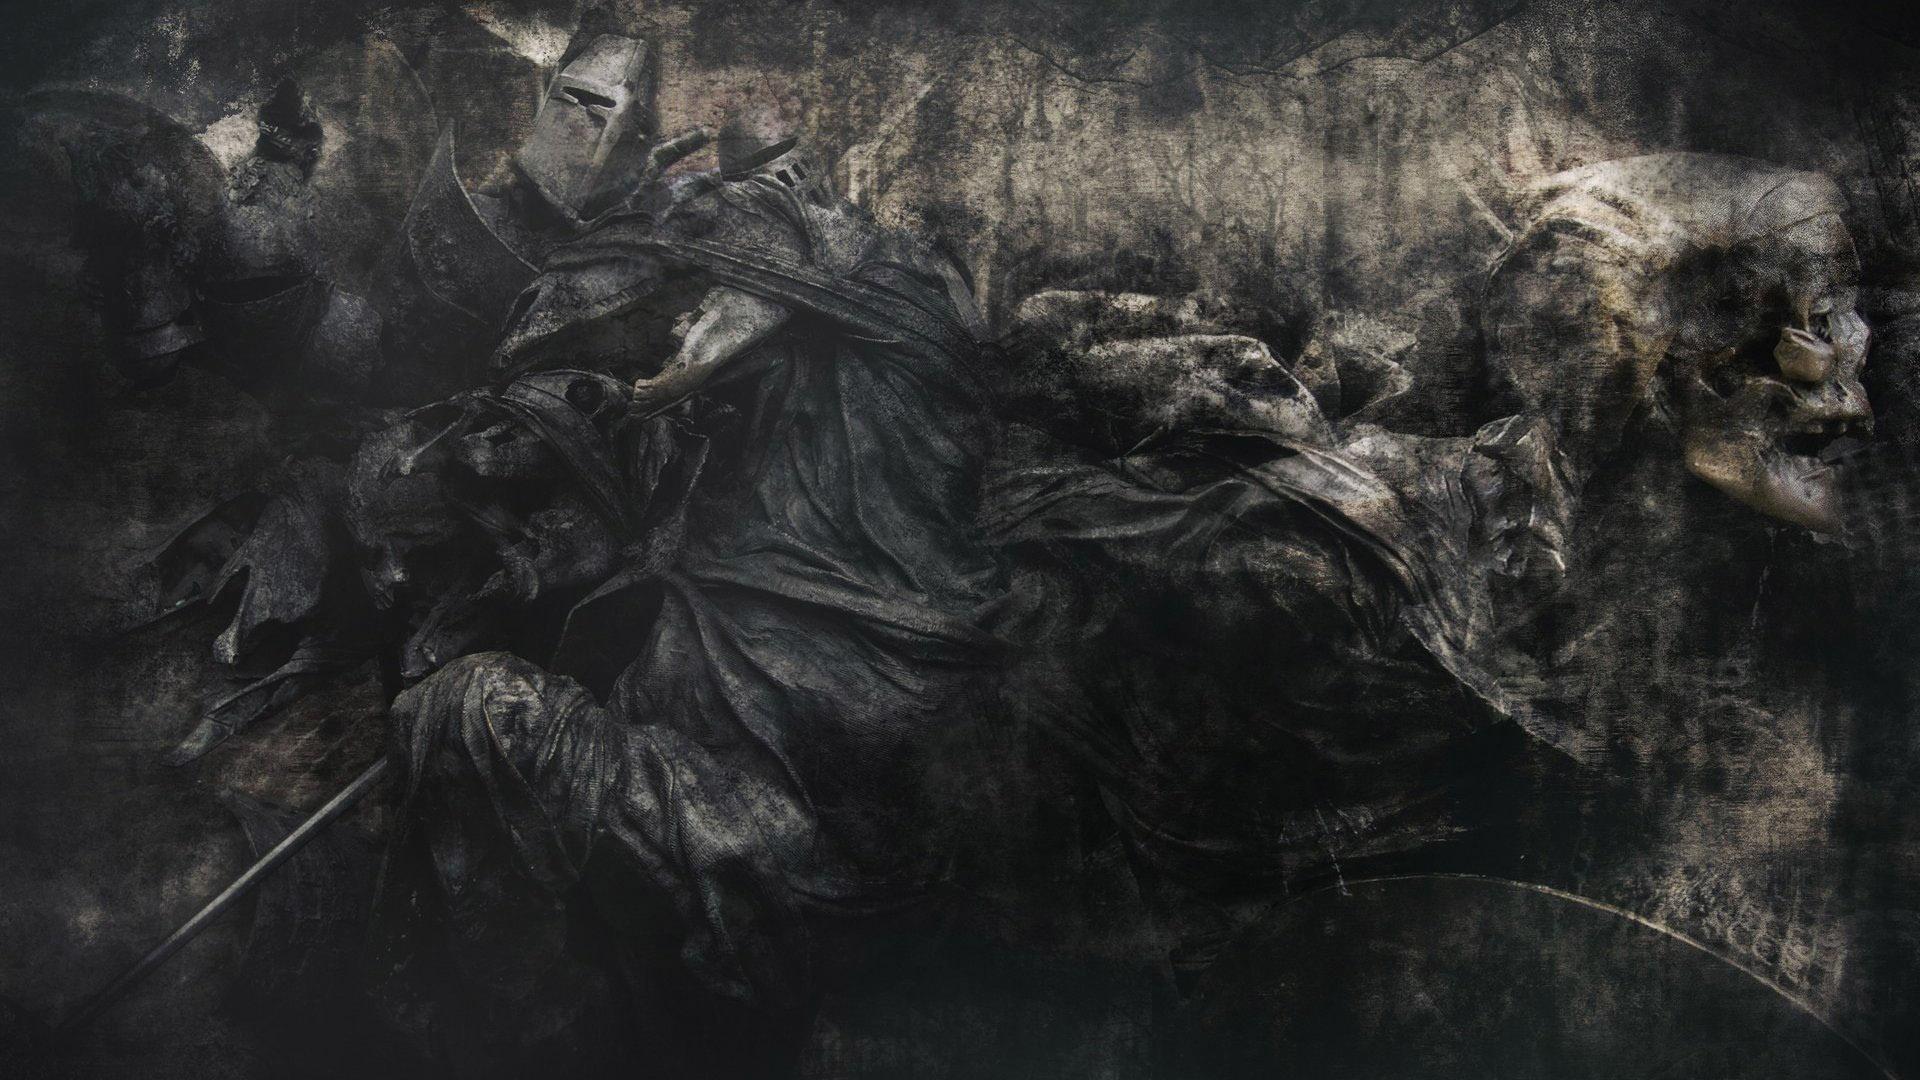 Wallpaper 1920x1080 Px Dark Dead Death Evil Gothic